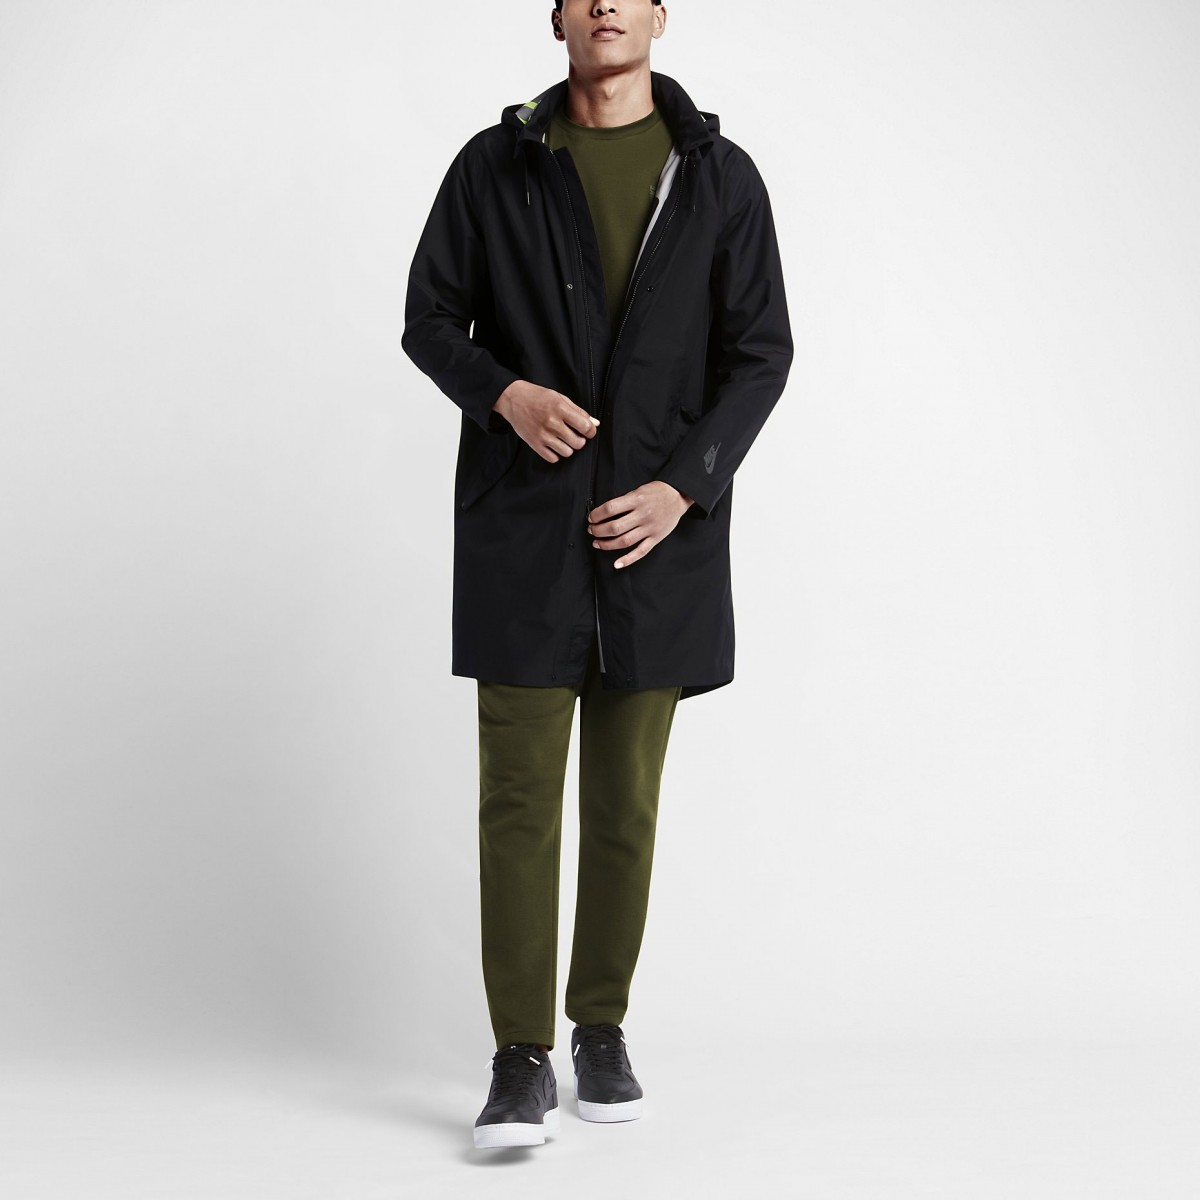 nikelab-essentials-apparel-collection-1-1200x1200